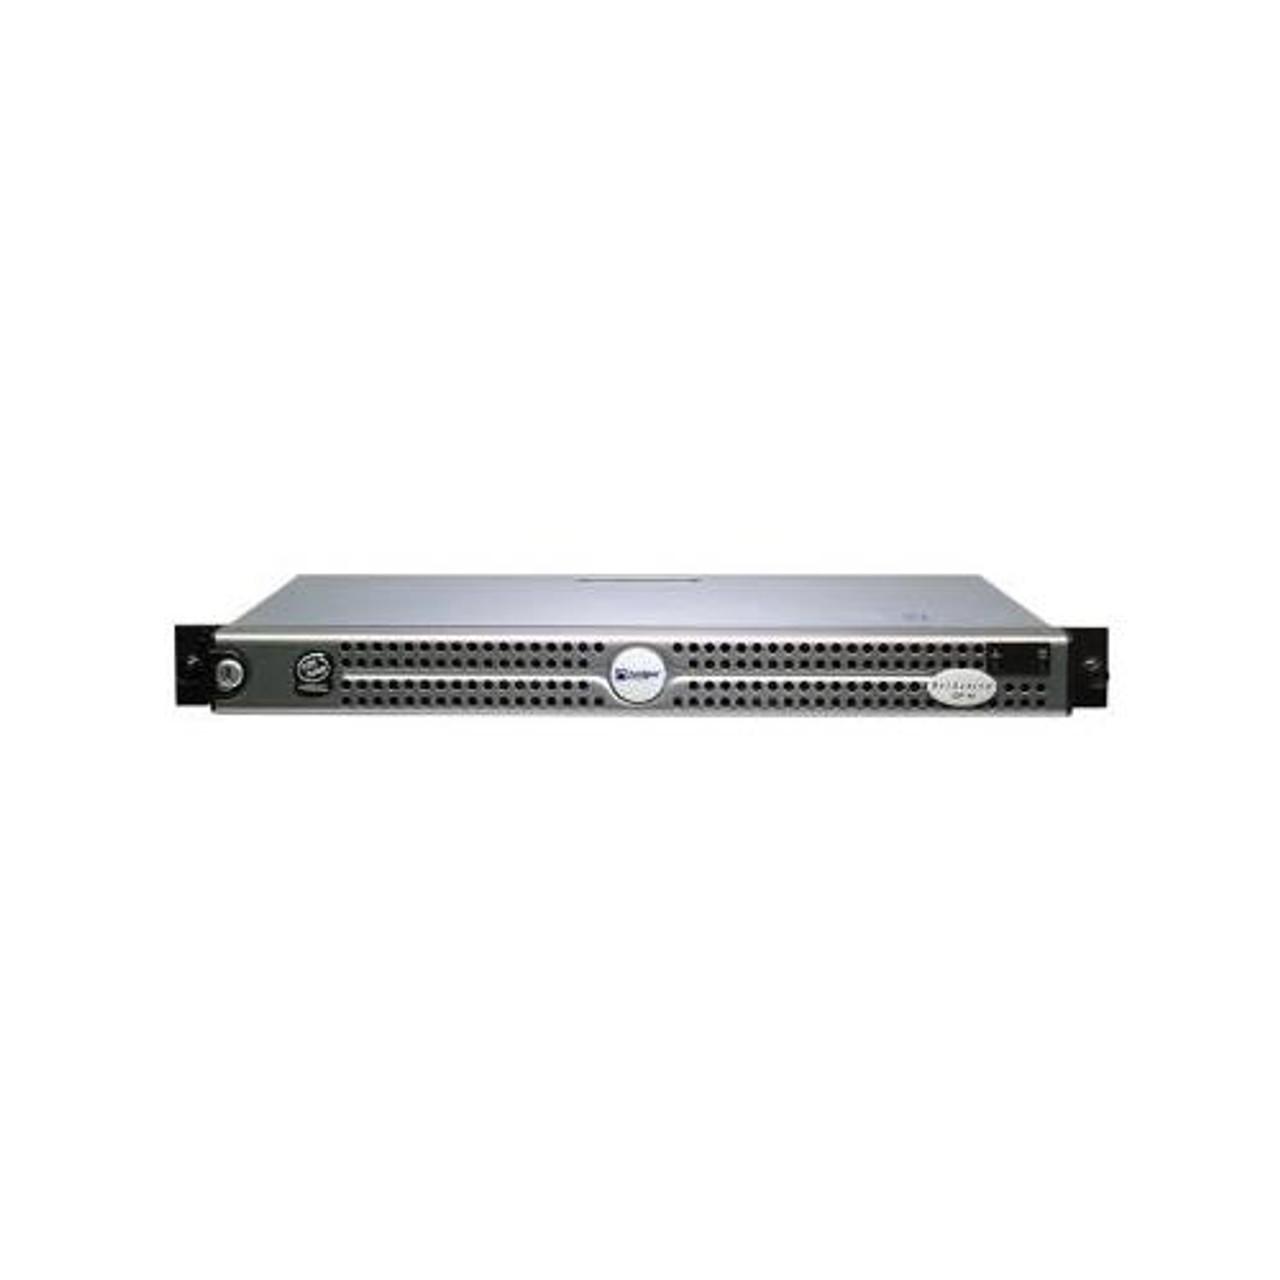 Single Replacement Key Hinge HP 255 G4 US Keyboard PK131EM2A00